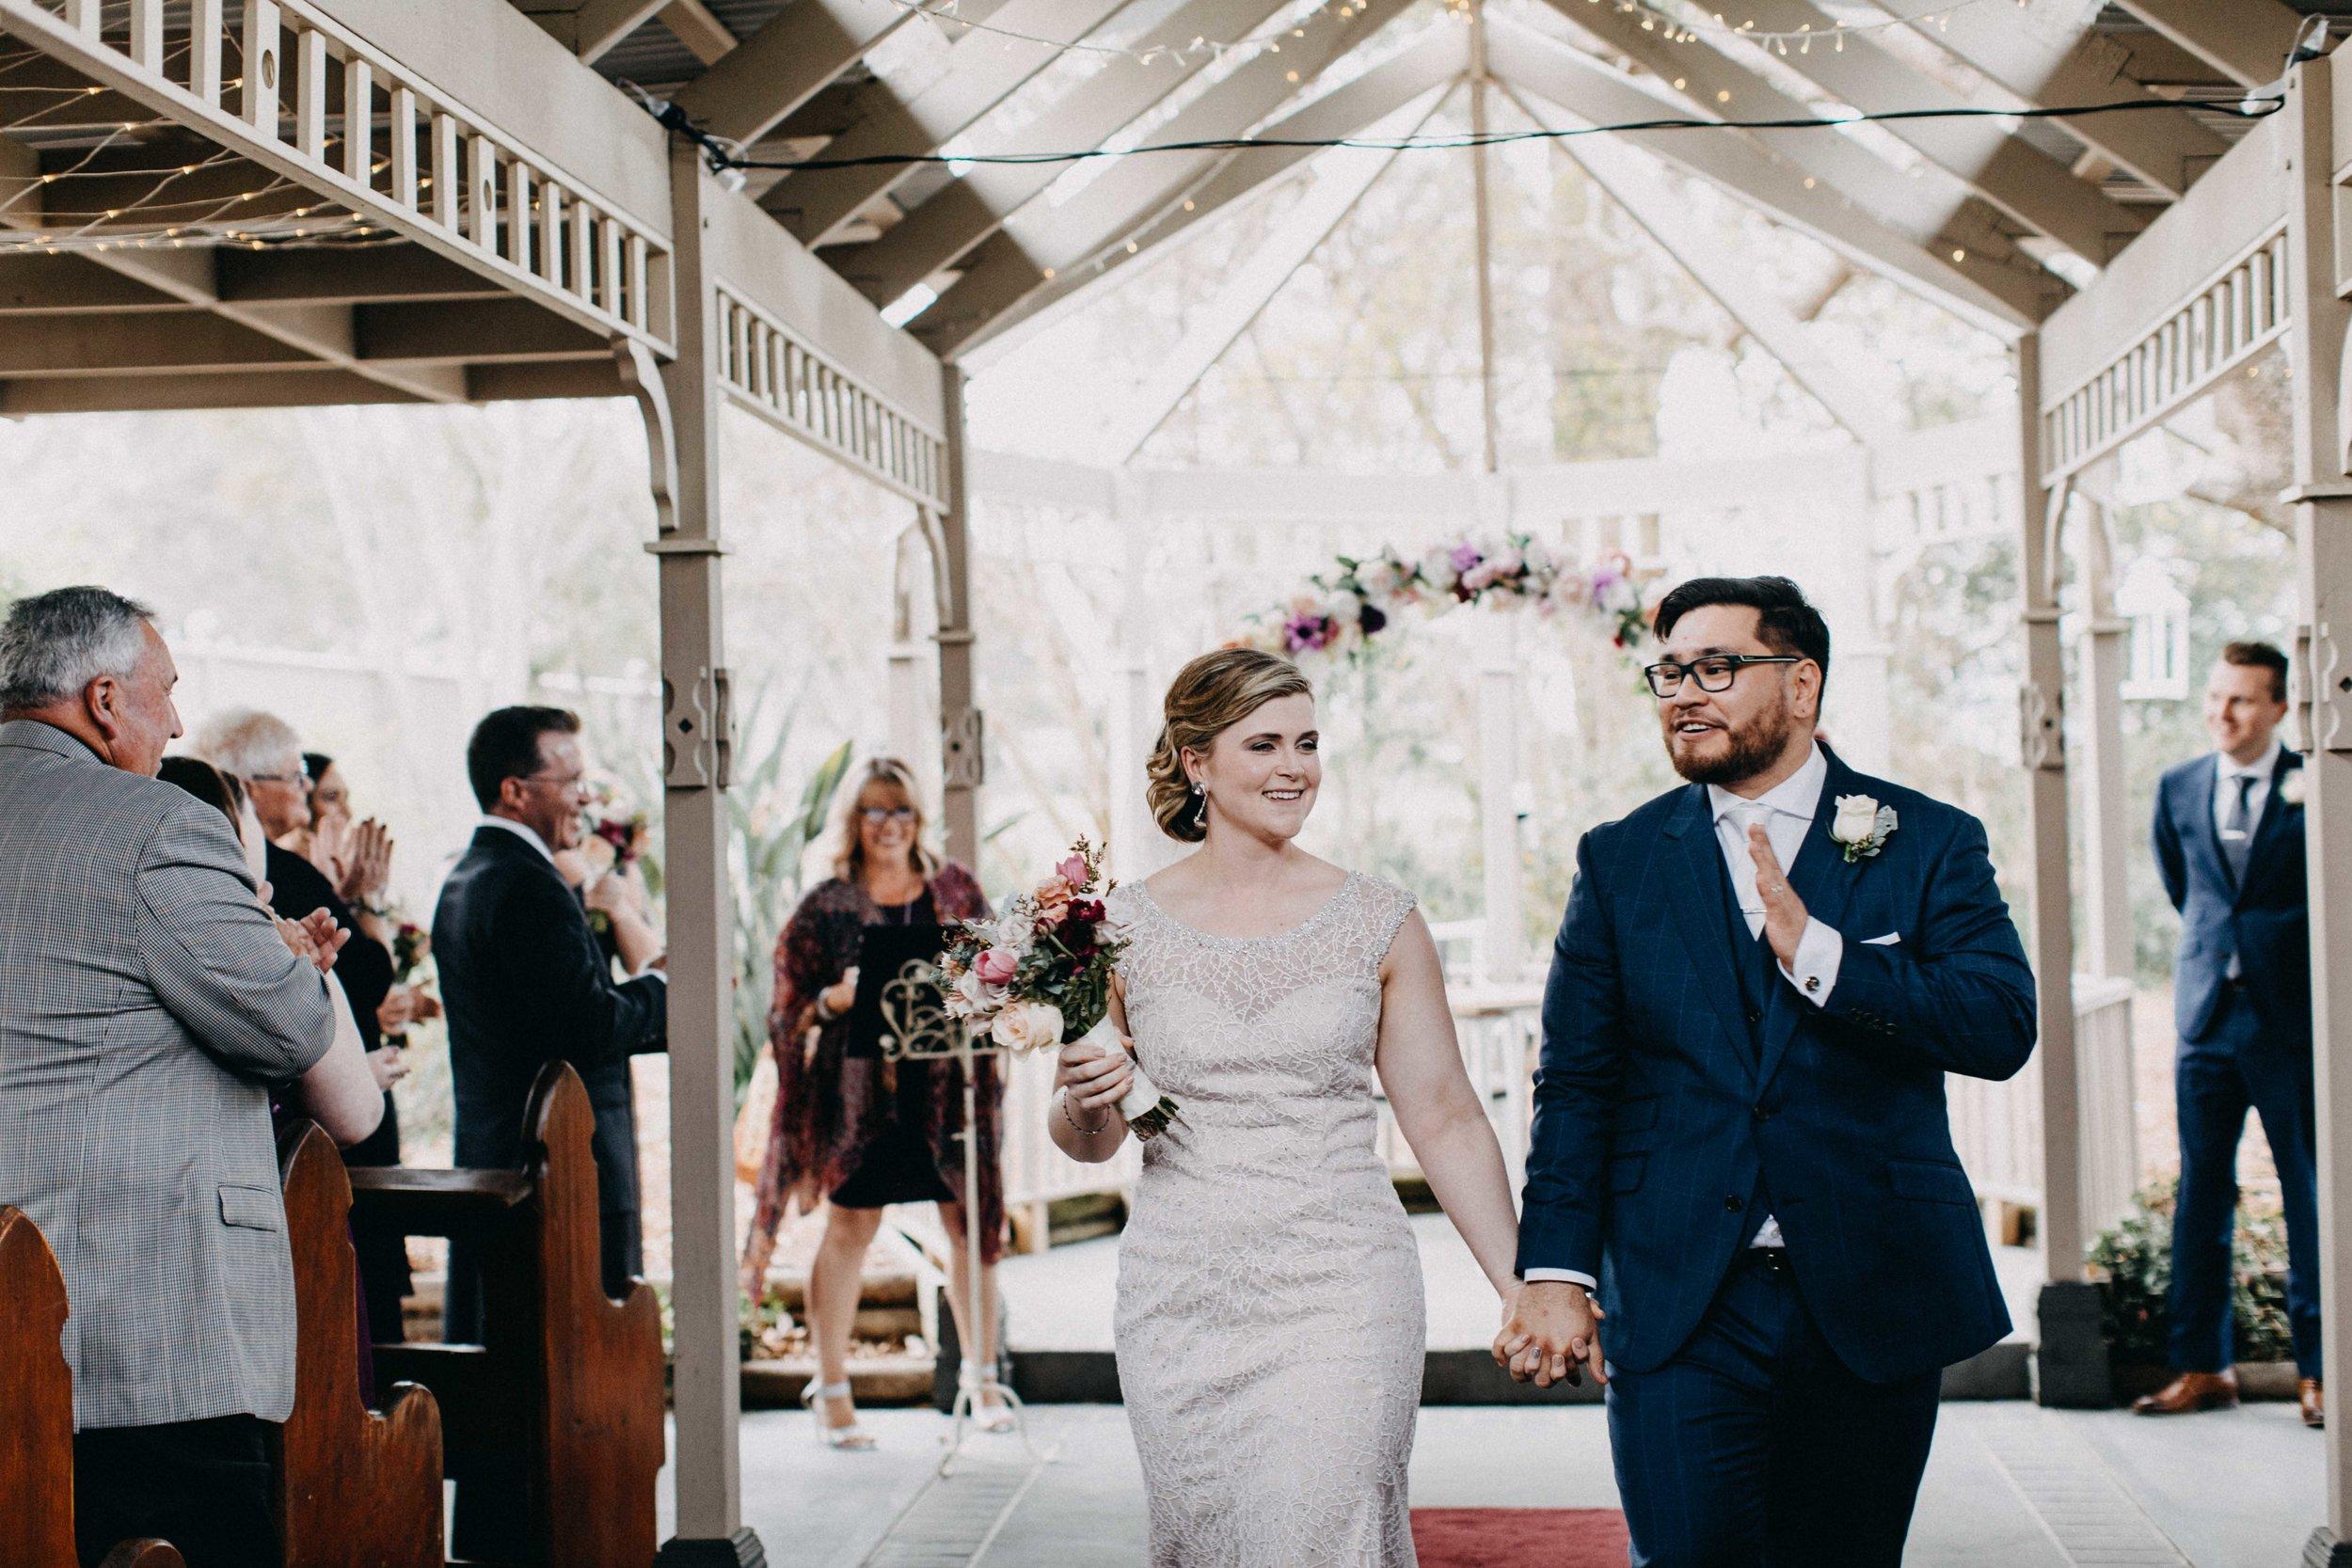 appin-house-wedding-macarthur-www.emilyobrienphotography.net-94.jpg